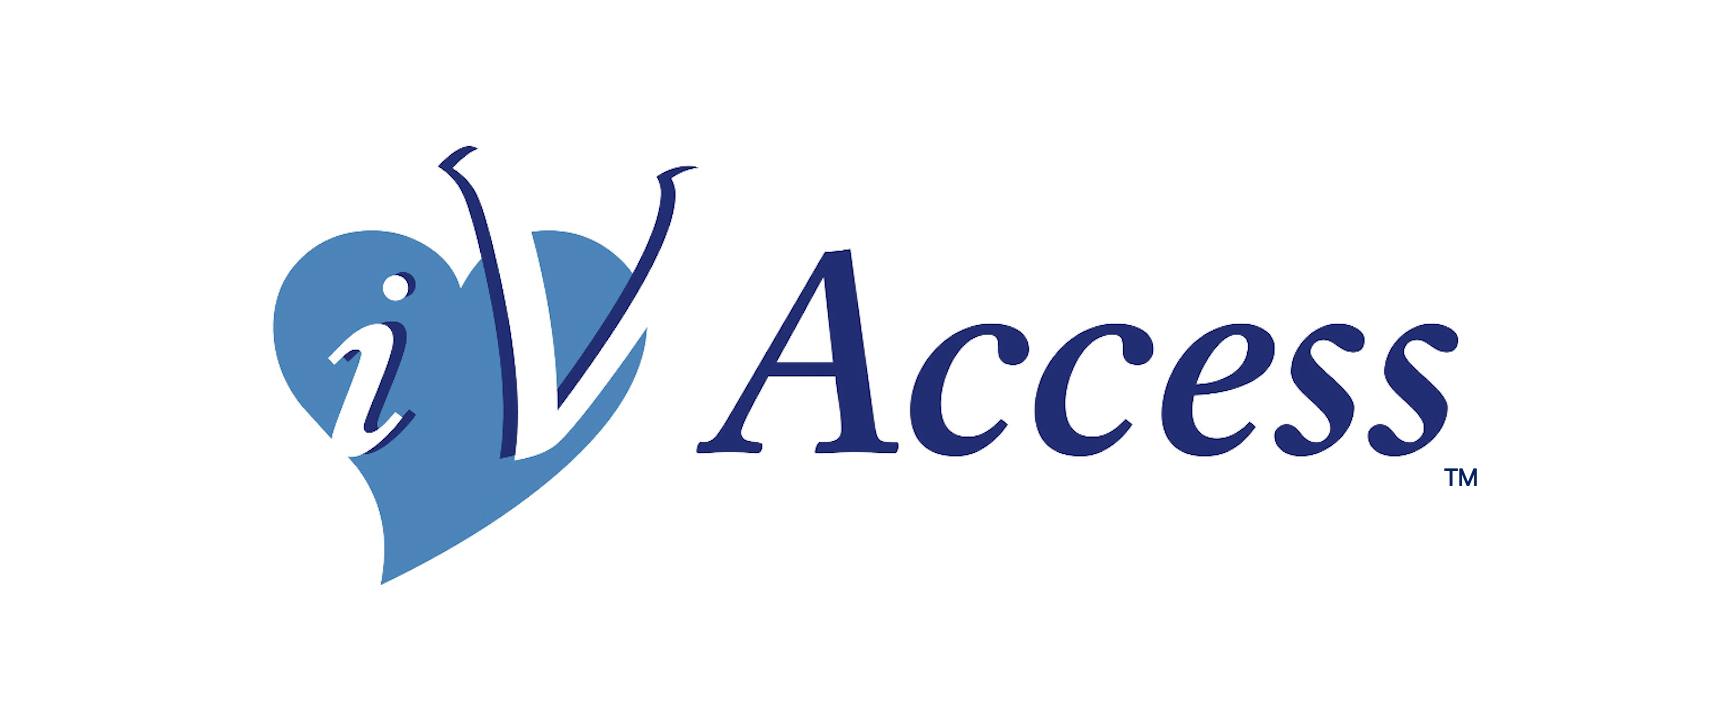 IV Access 2.jpg